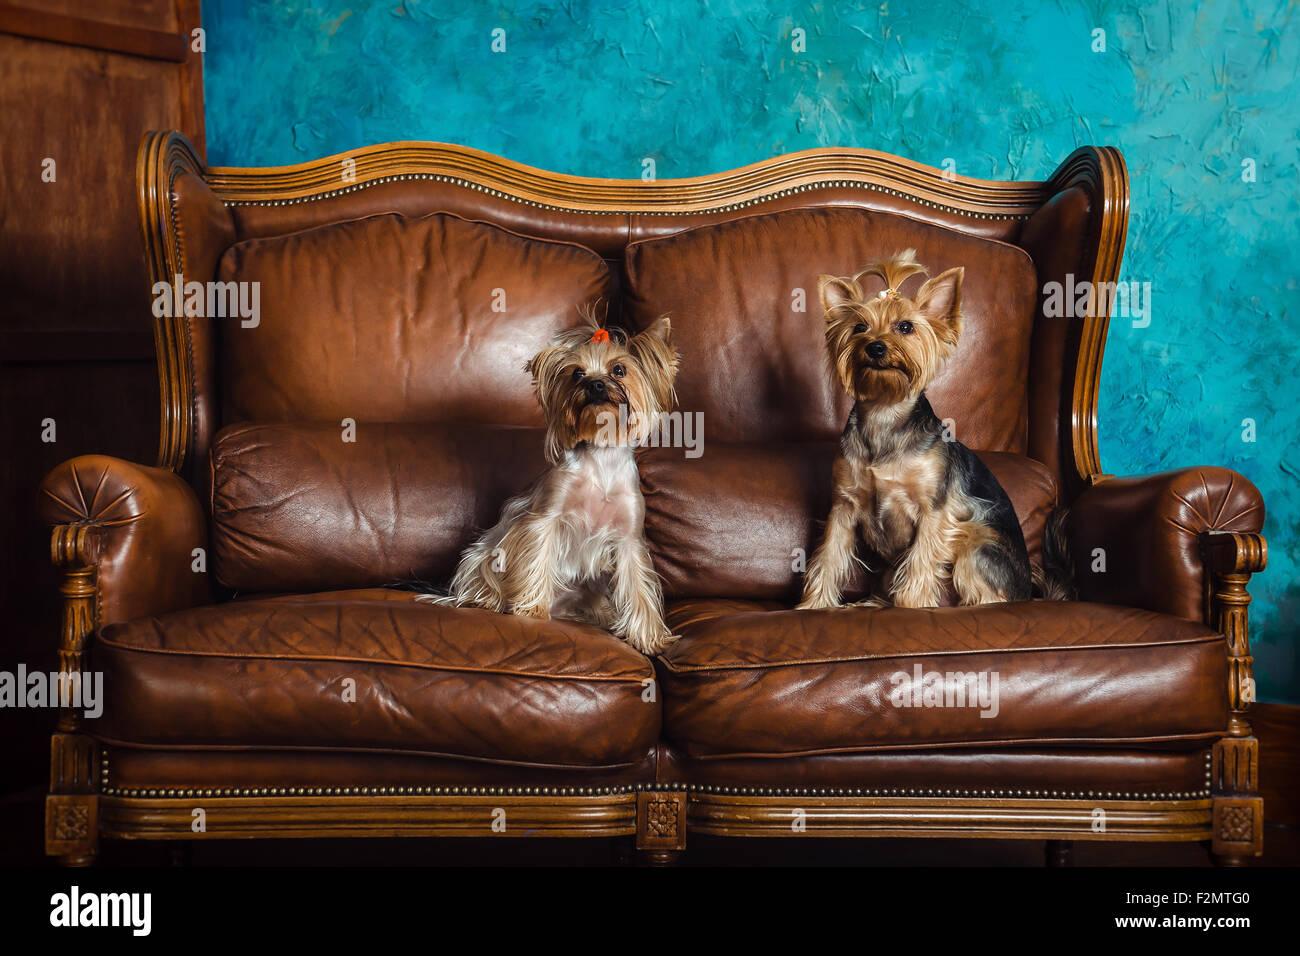 terriers on a brown sofa in blue vintage bathroom - Stock Image